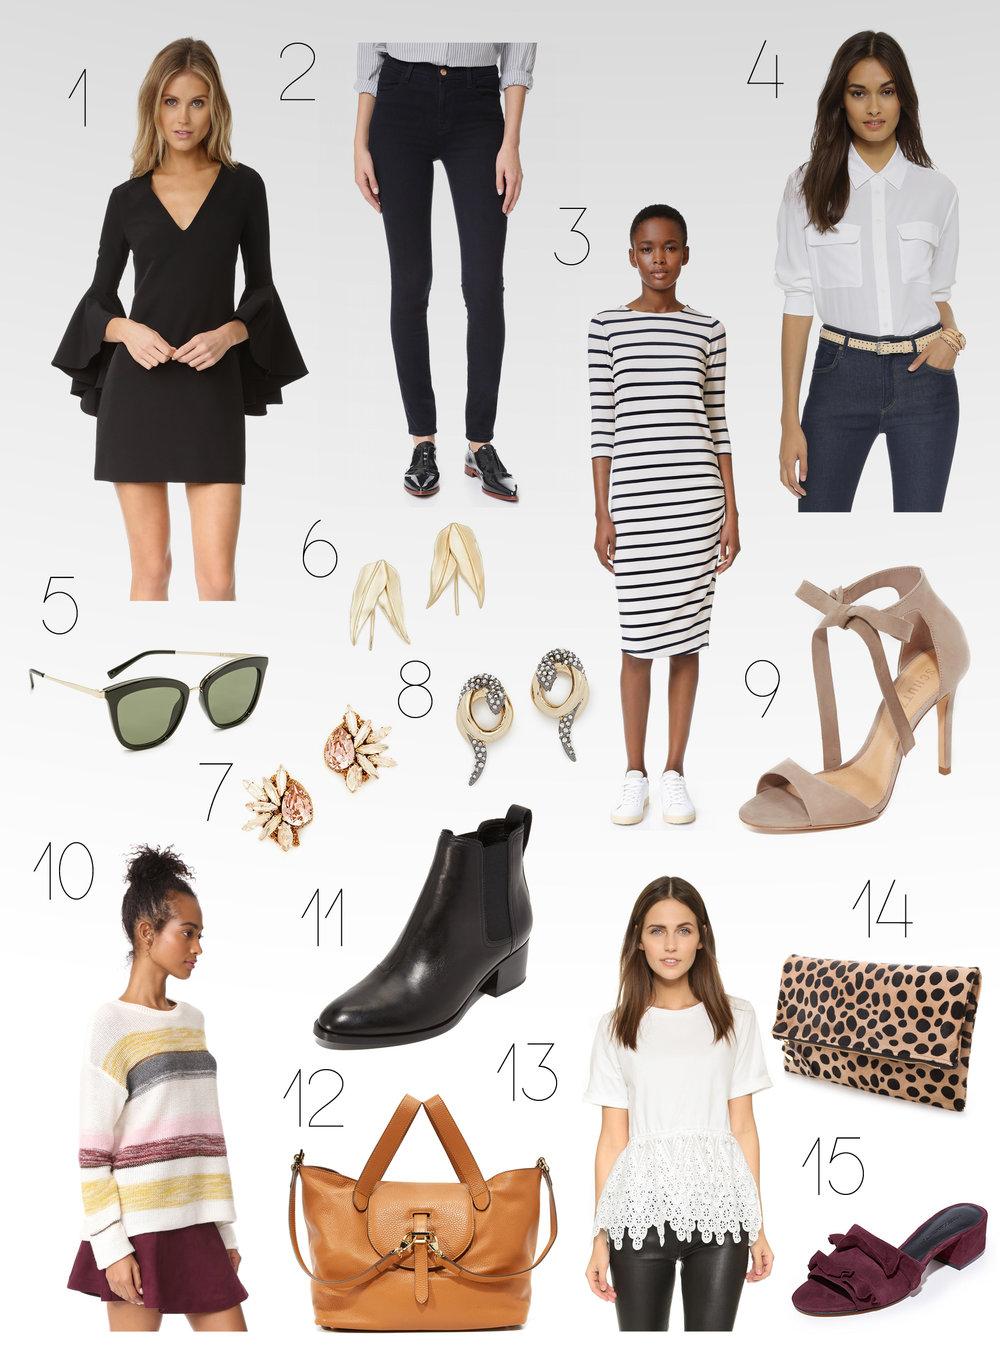 Maggie-a-la-Mode---Wednesday-Wish-List-Shopbop-Sale-Picks.jpg